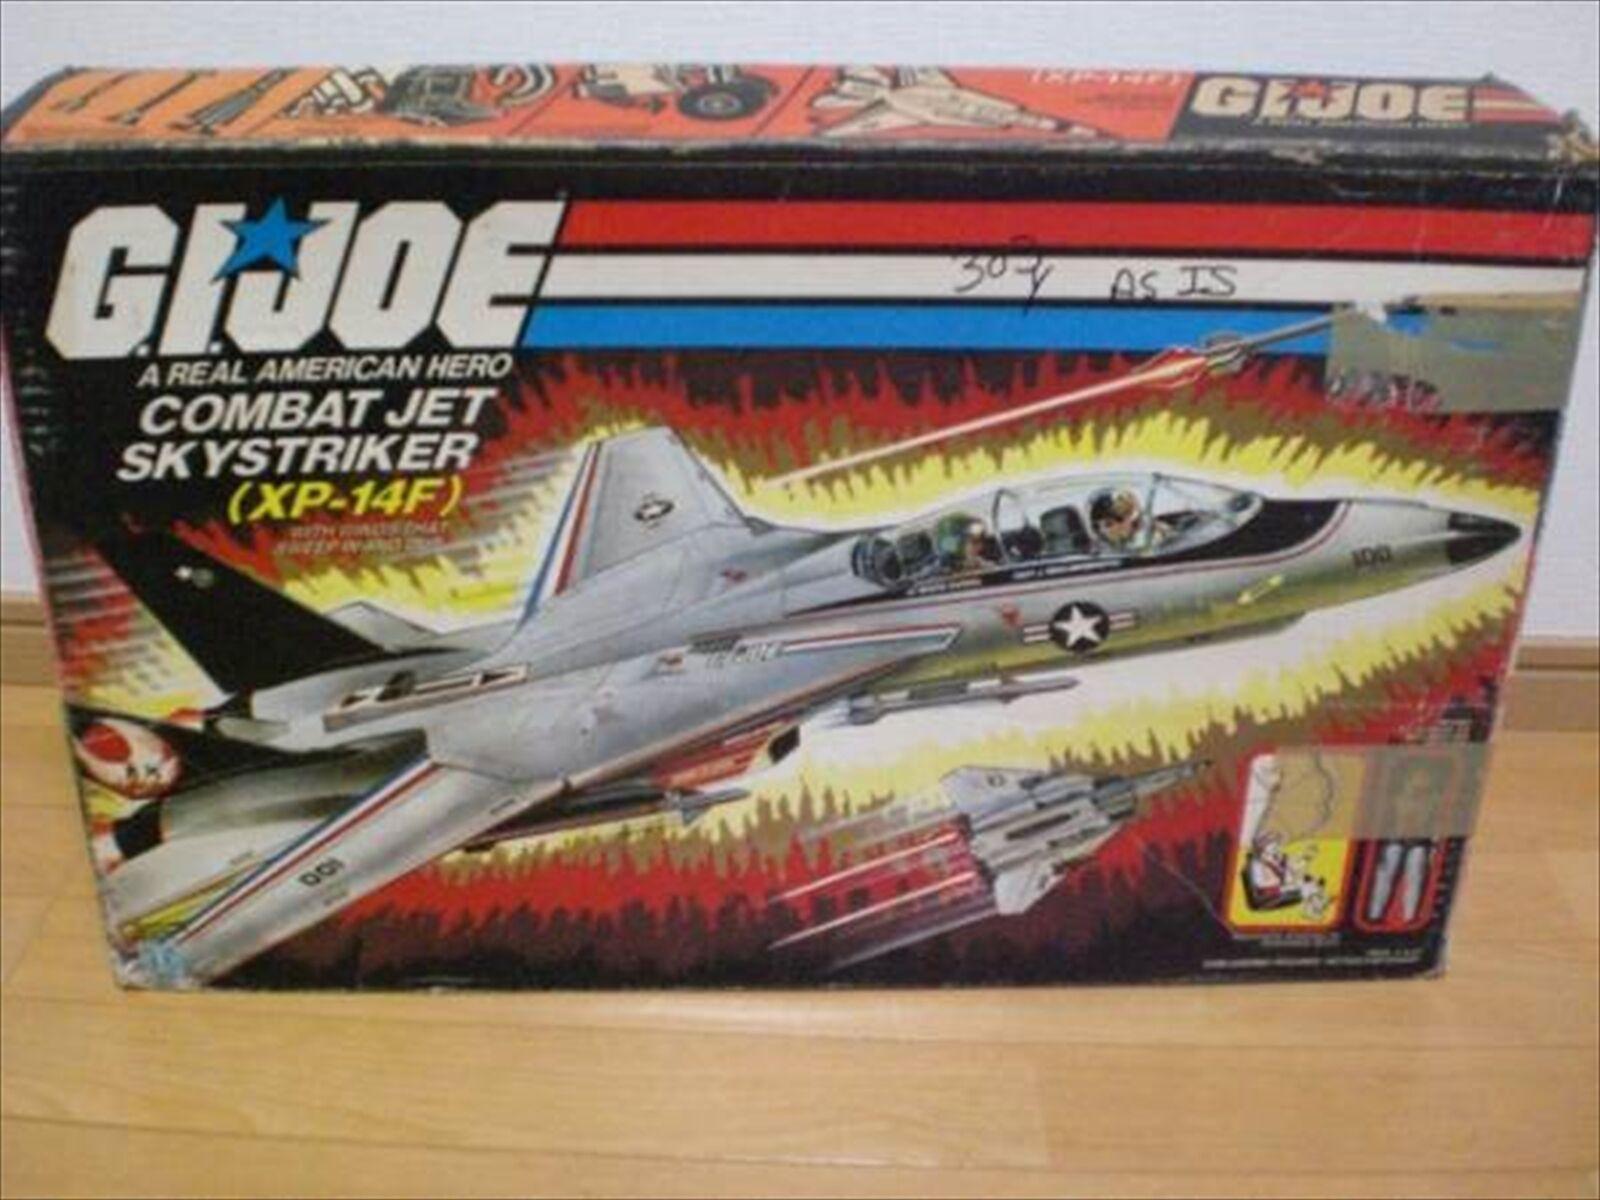 Vintage Takara G.I. Joe COMBAT JET SKYSTRIKER  (XP-14F) from Japan F S  offrant 100%